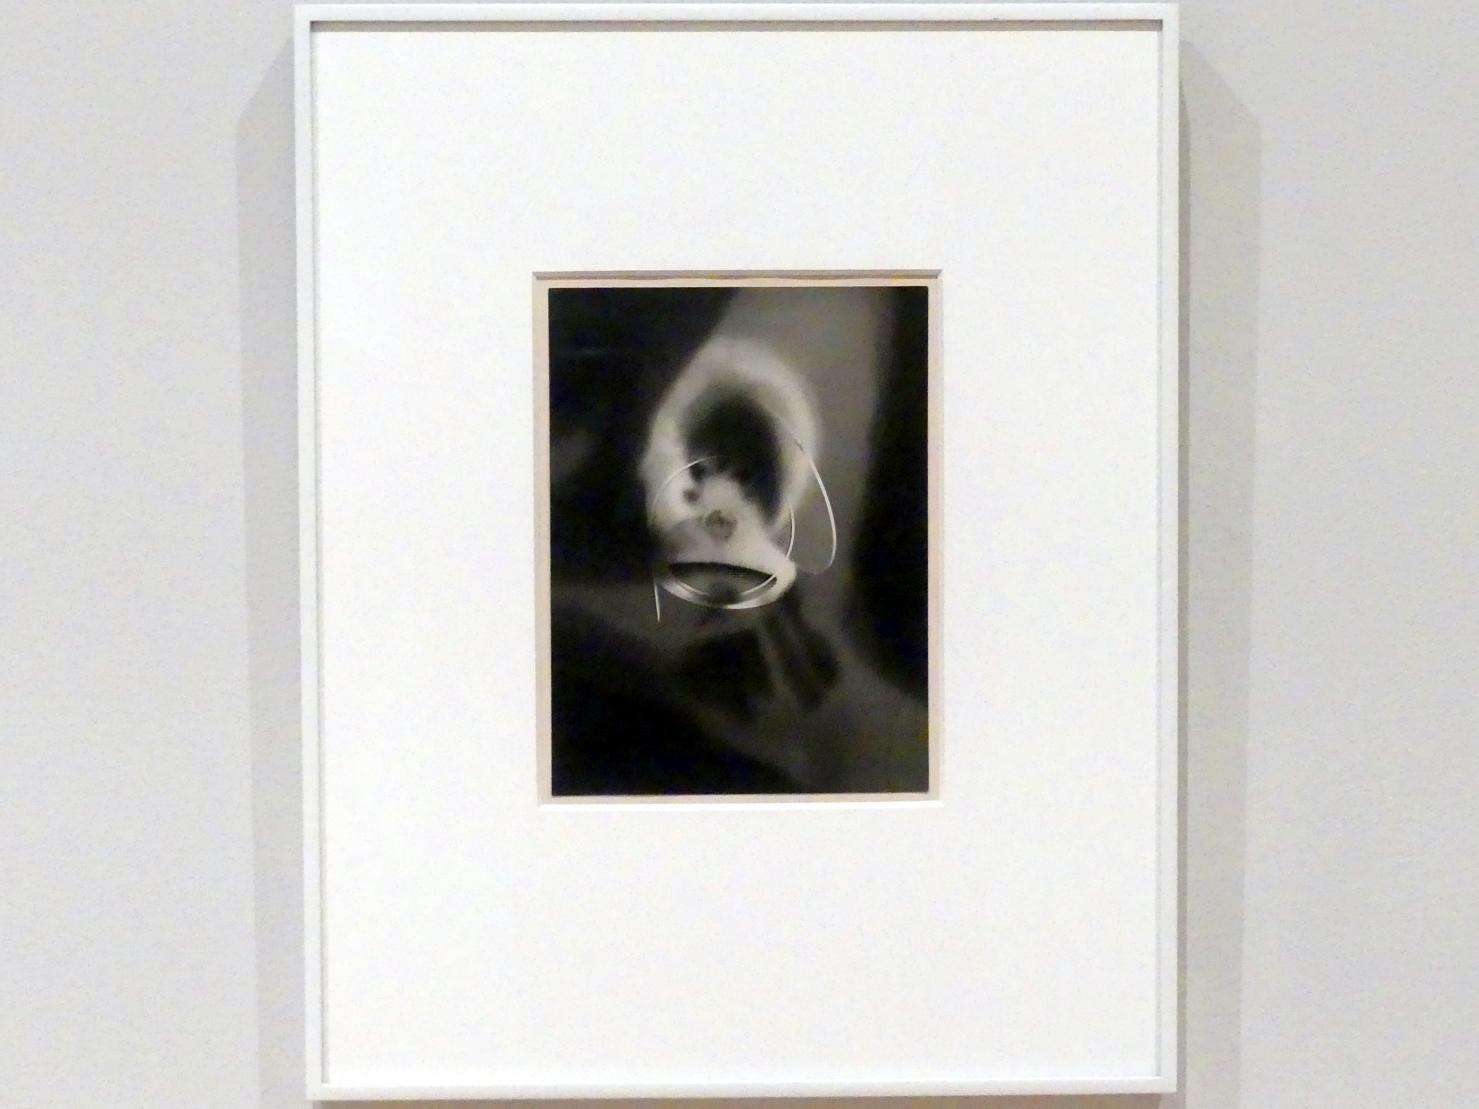 Man Ray: Rayograph, 1923